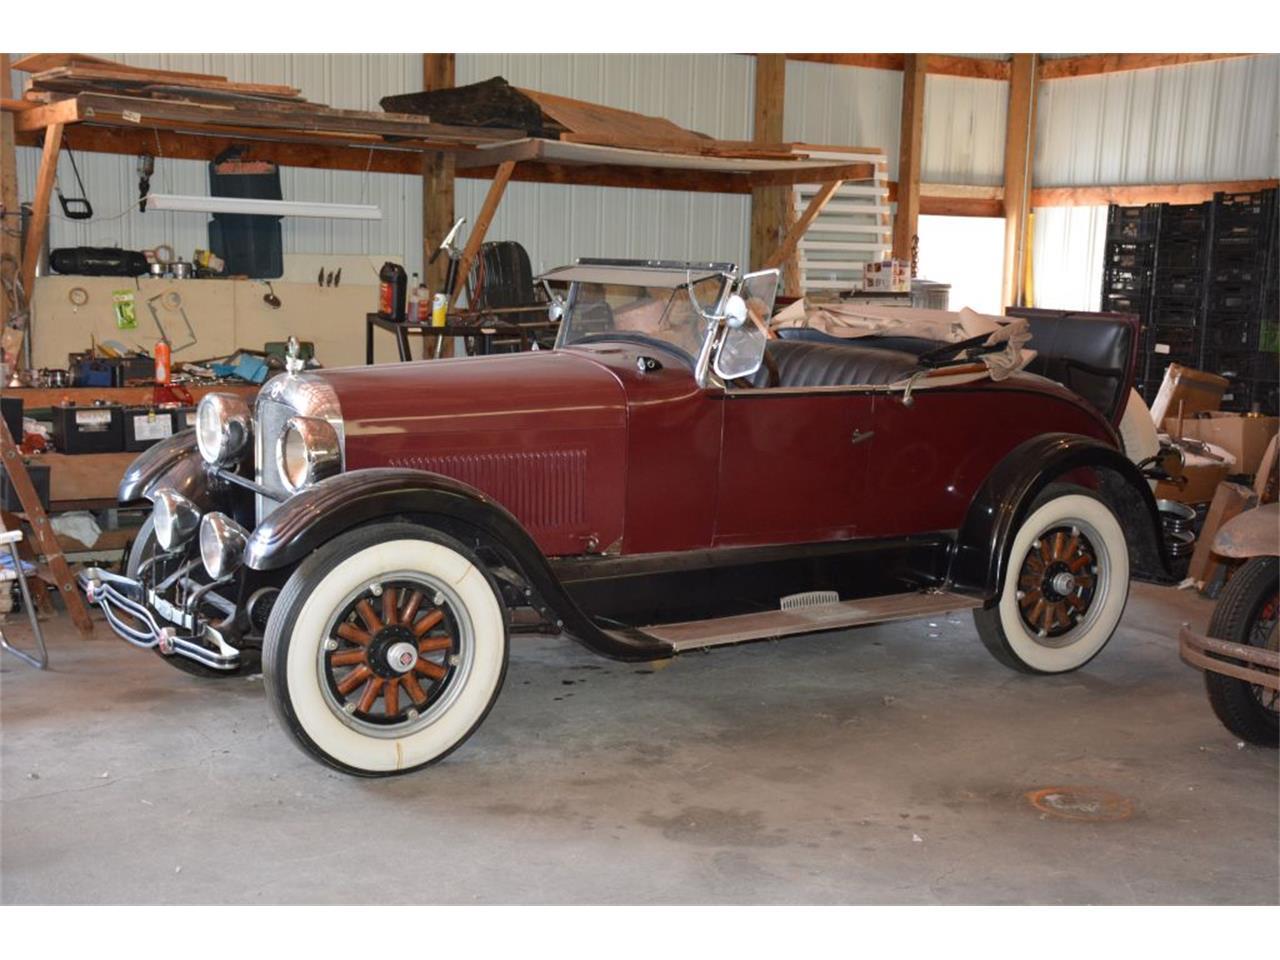 1926 CHEVROLET LANDAU SERIES V COUPE - 79256